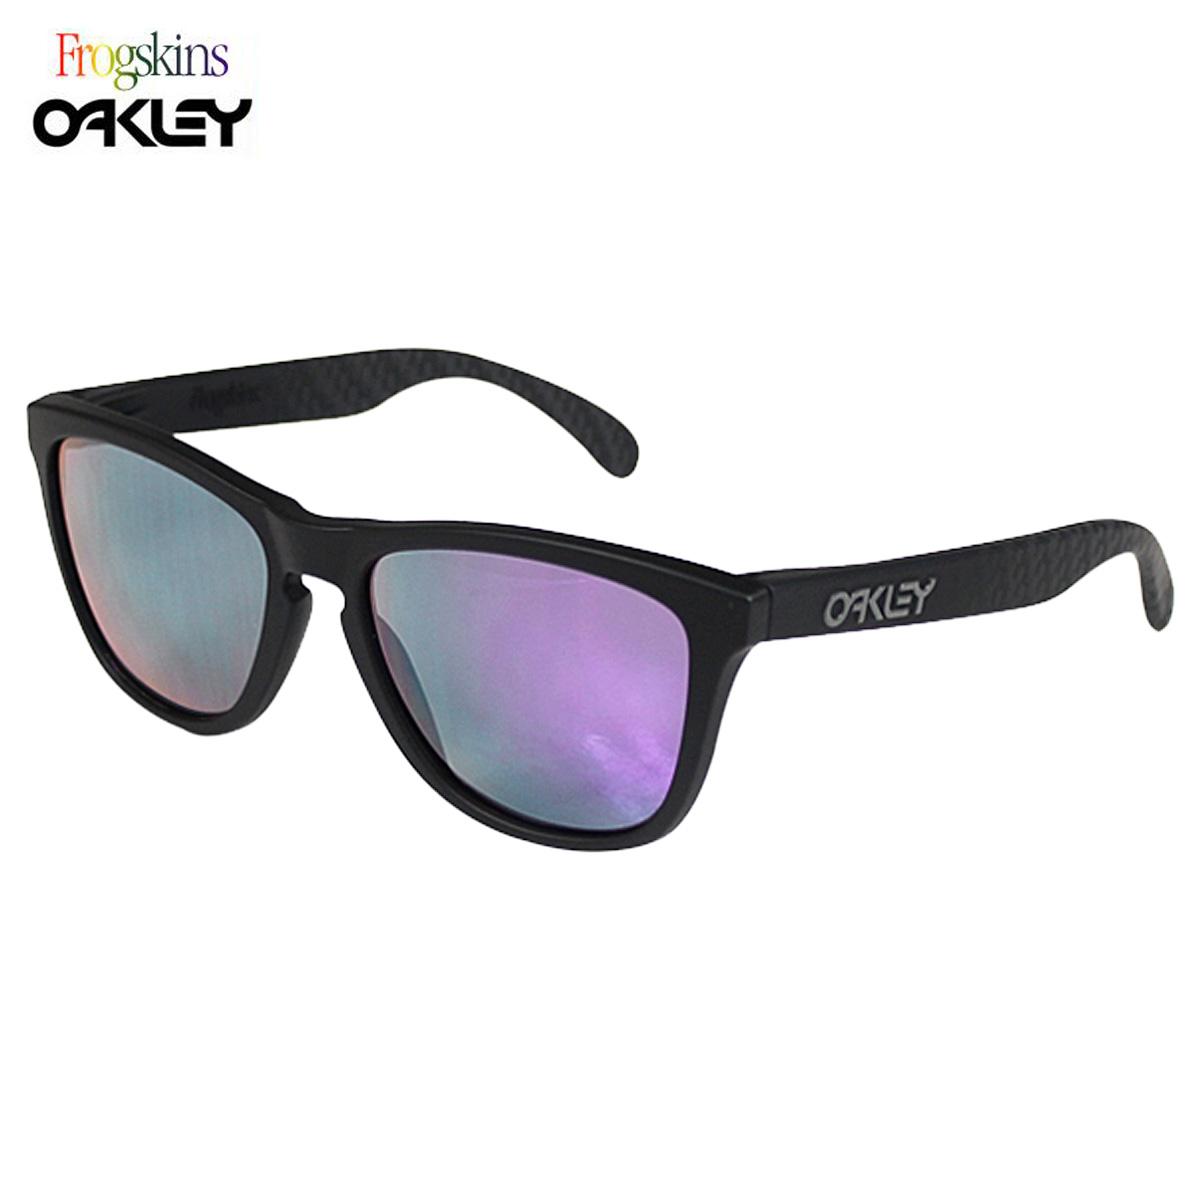 d3321c2f9992 ... denmark oakley frogskins soft touch sunglasses style 24 399. visible  light transmission 15 uv transmittance